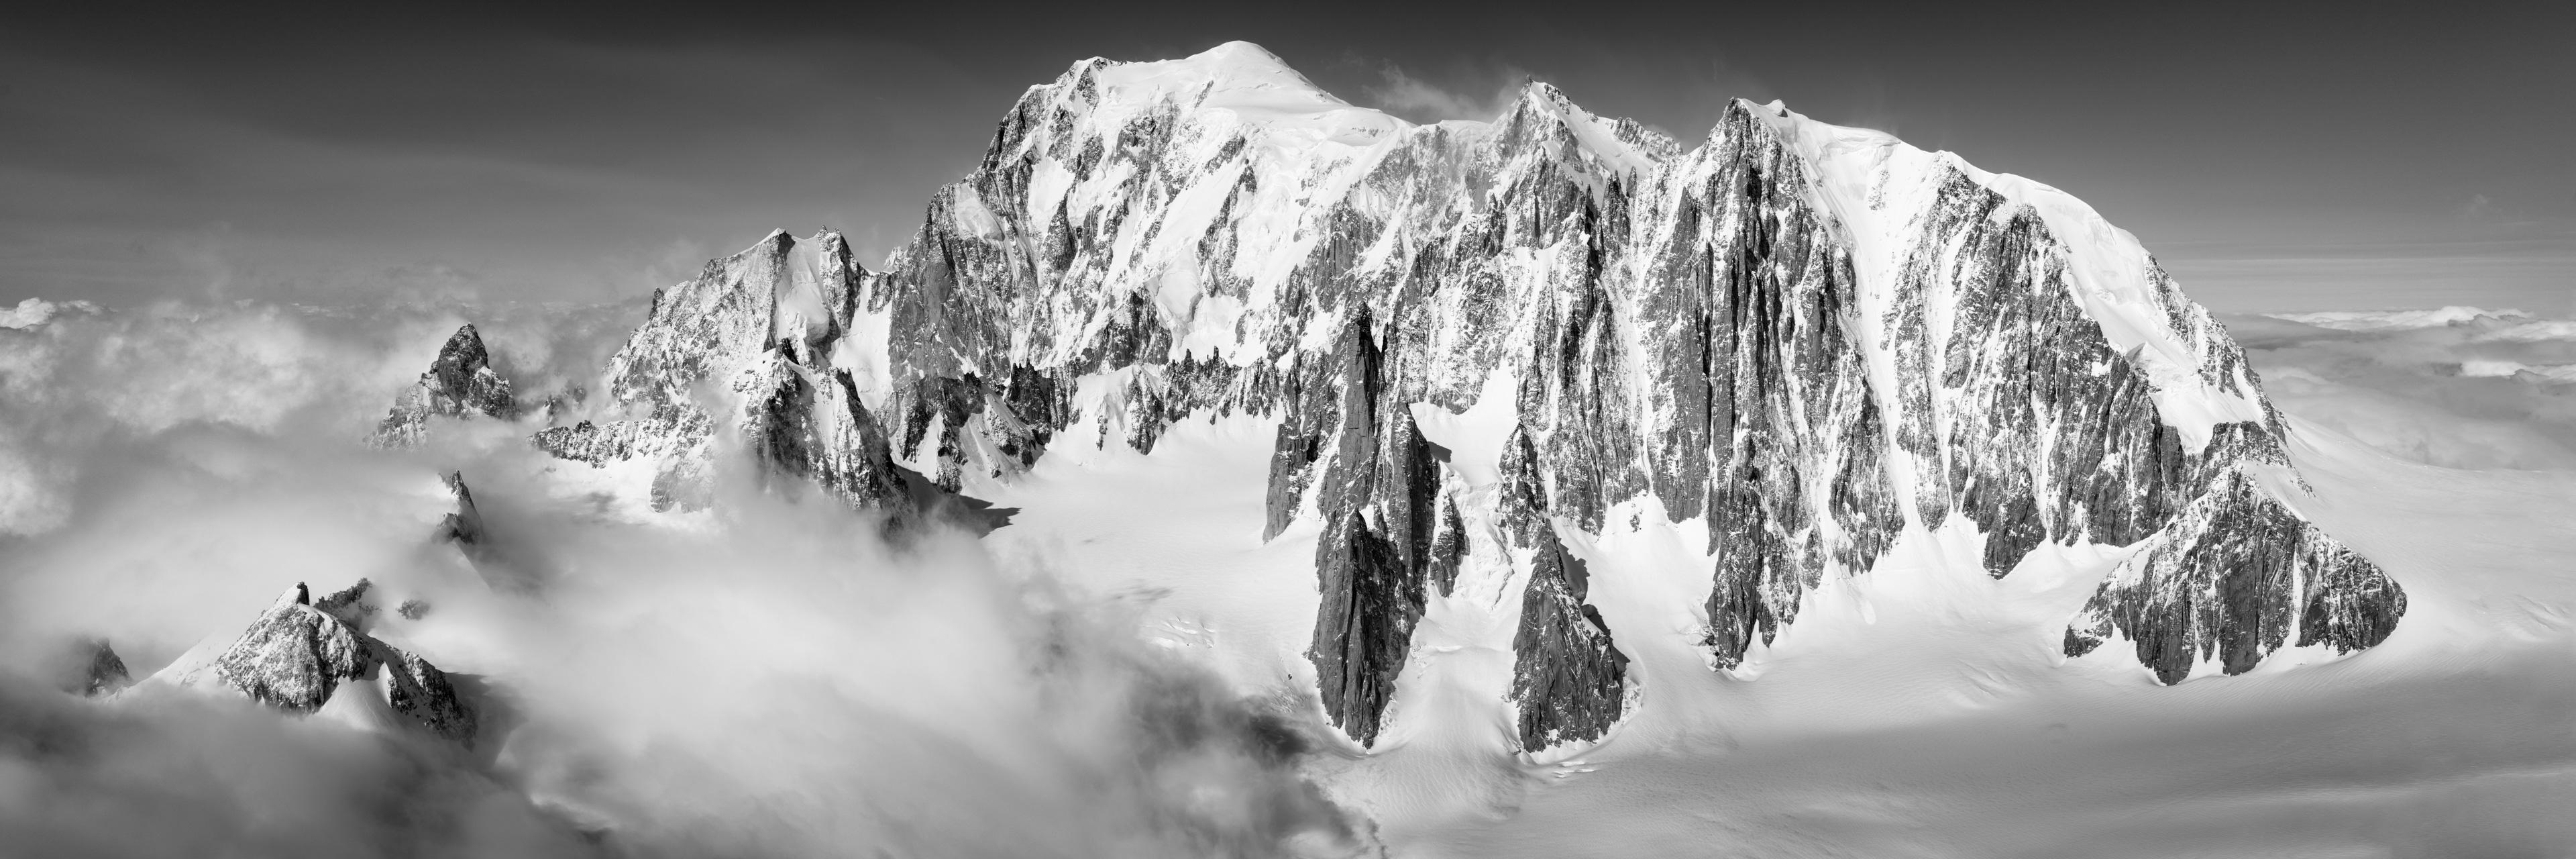 panorama sommet mont blanc photo paysage montagne